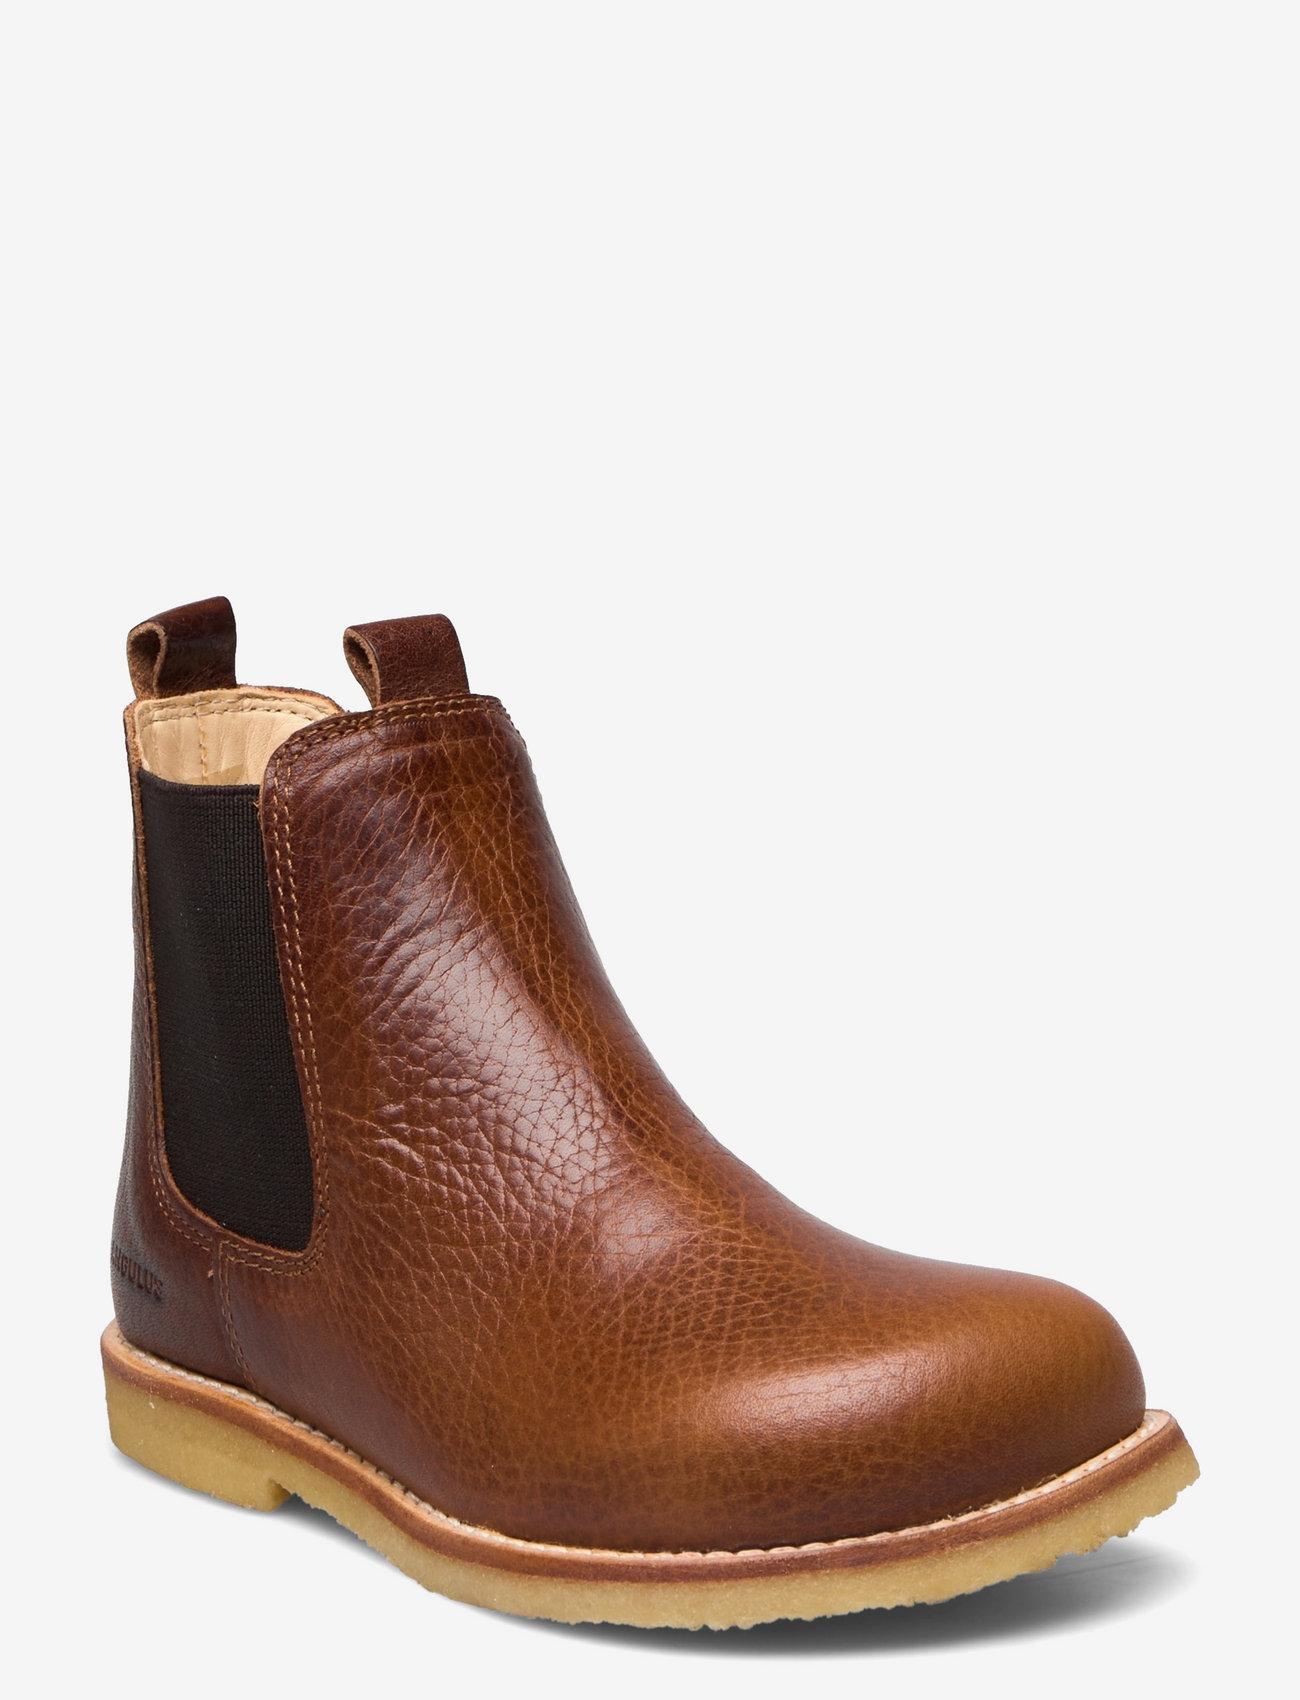 ANGULUS - Chelsea boot - støvler - 2509/002 medium brown/medium b - 0